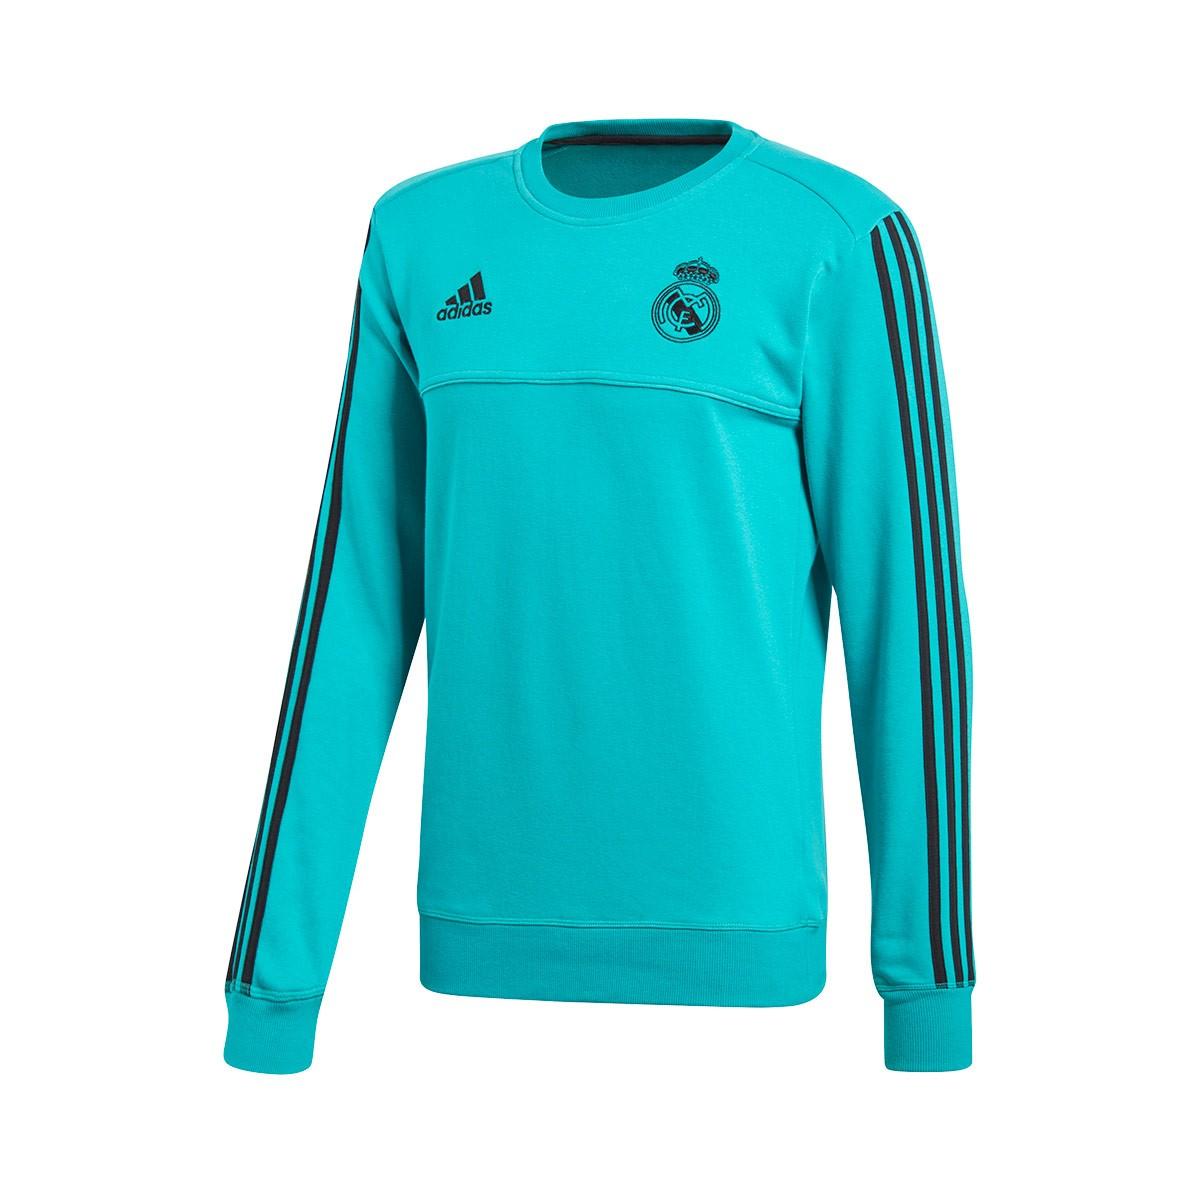 Sudadera adidas Real Madrid Top 2017-2018 Aero reef - Soloporteros es ahora  Fútbol Emotion 2b7da4ab7381f